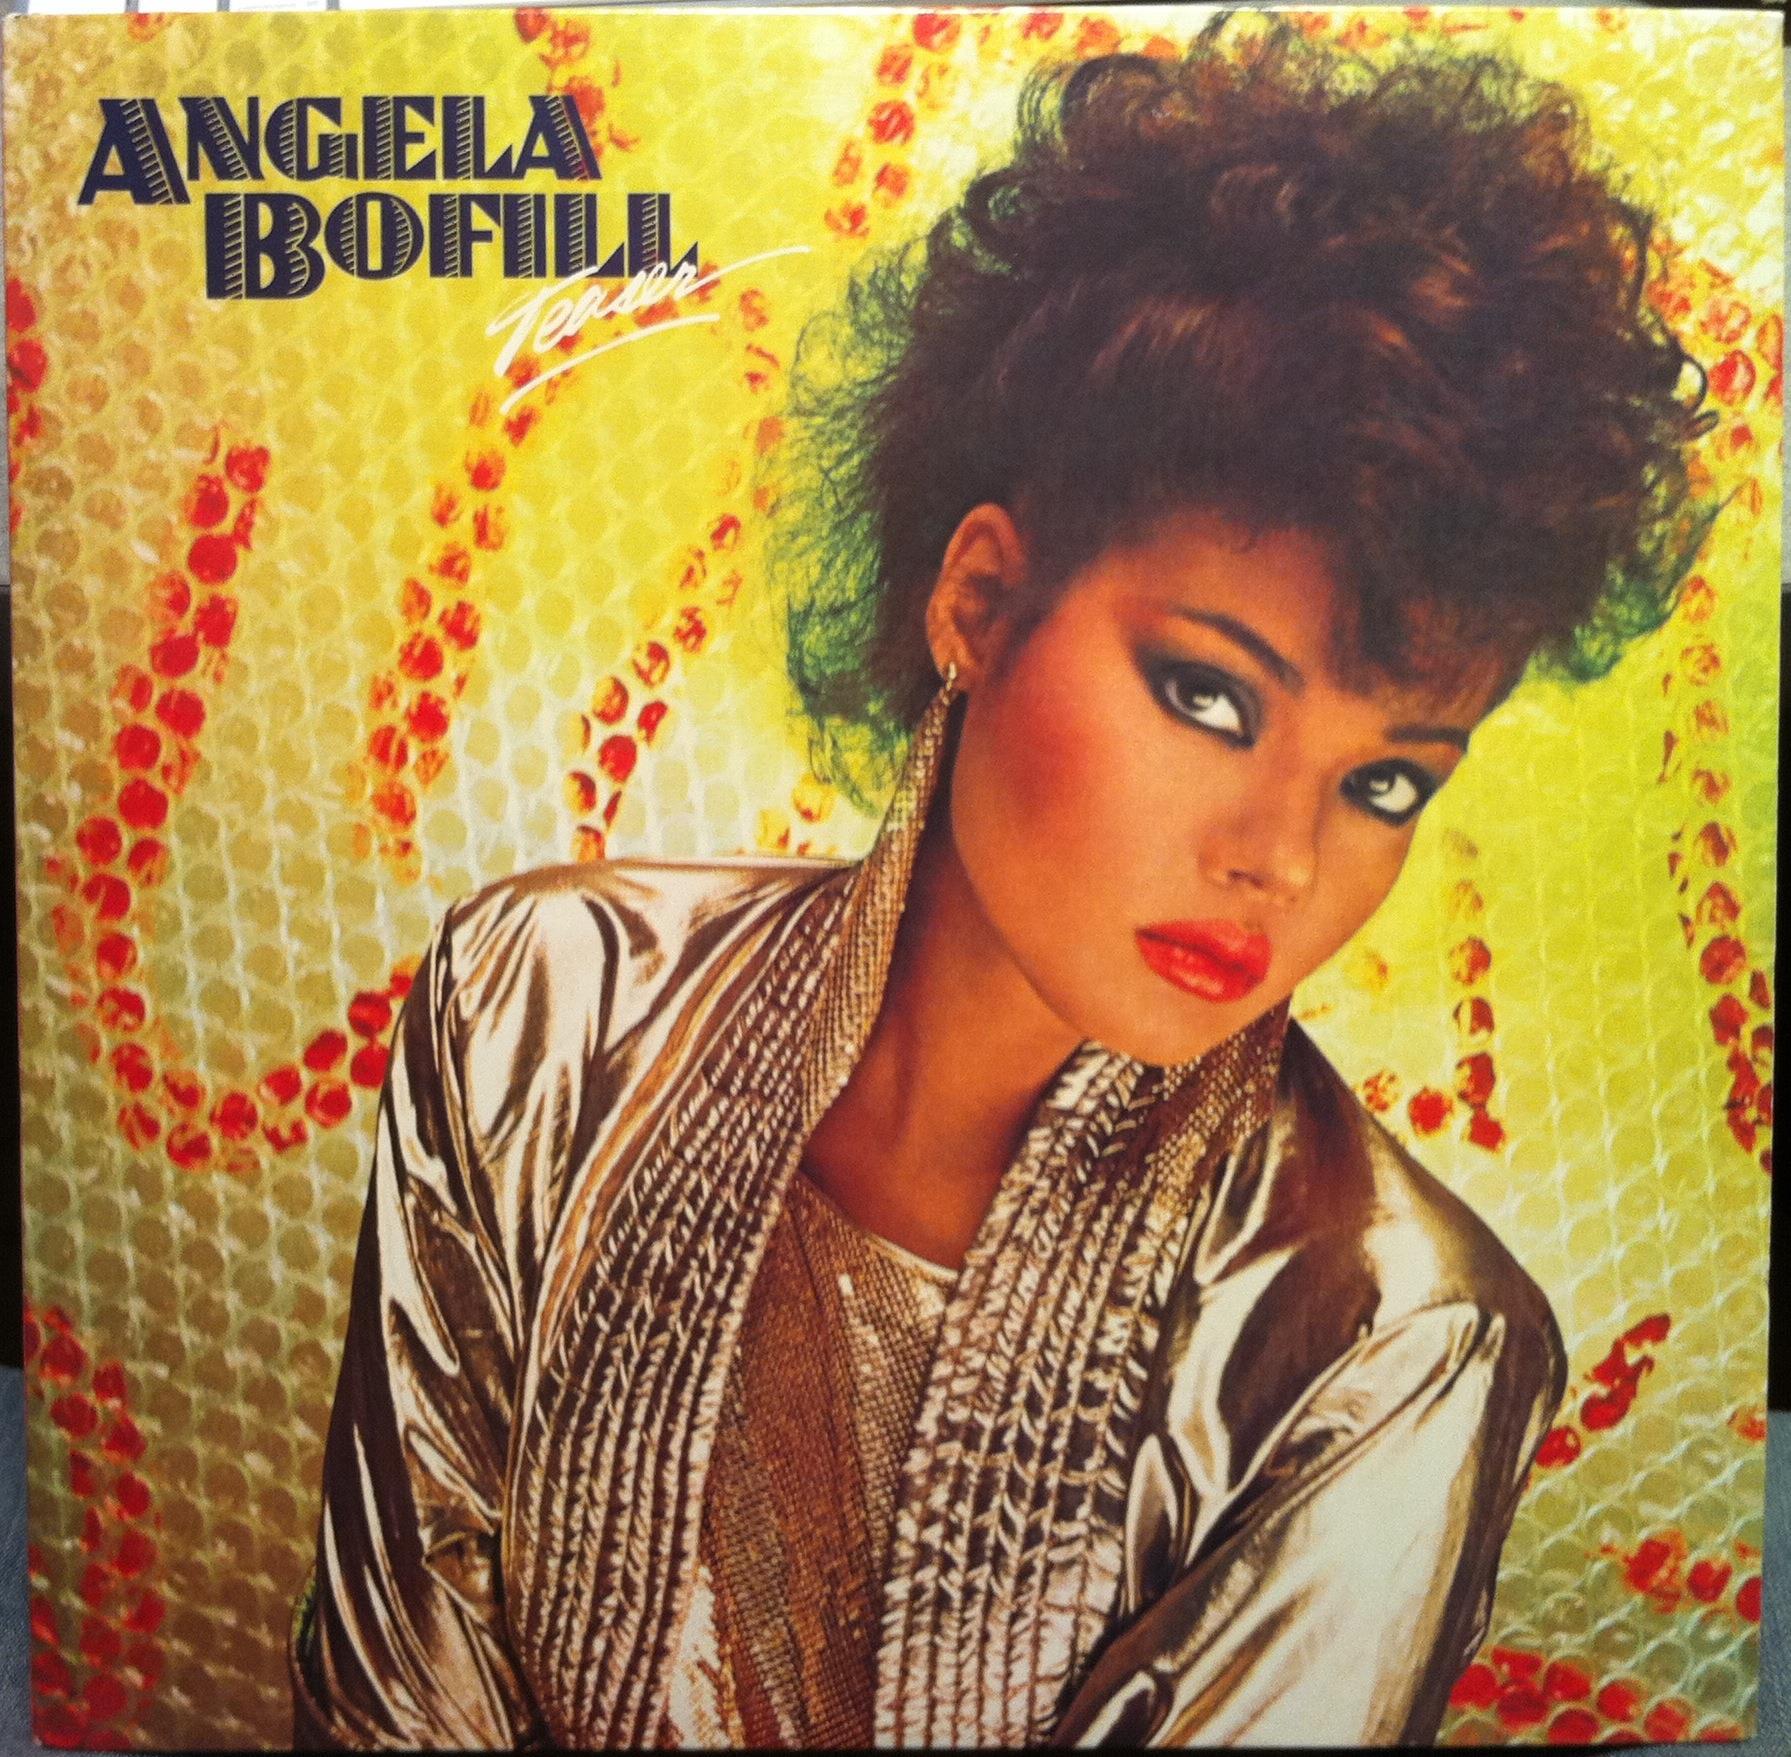 ANGELA BOFILL - Angela Bofill Teaser Lp Mint- Al 8 8198 Vinyl 1983 Record (teaser)